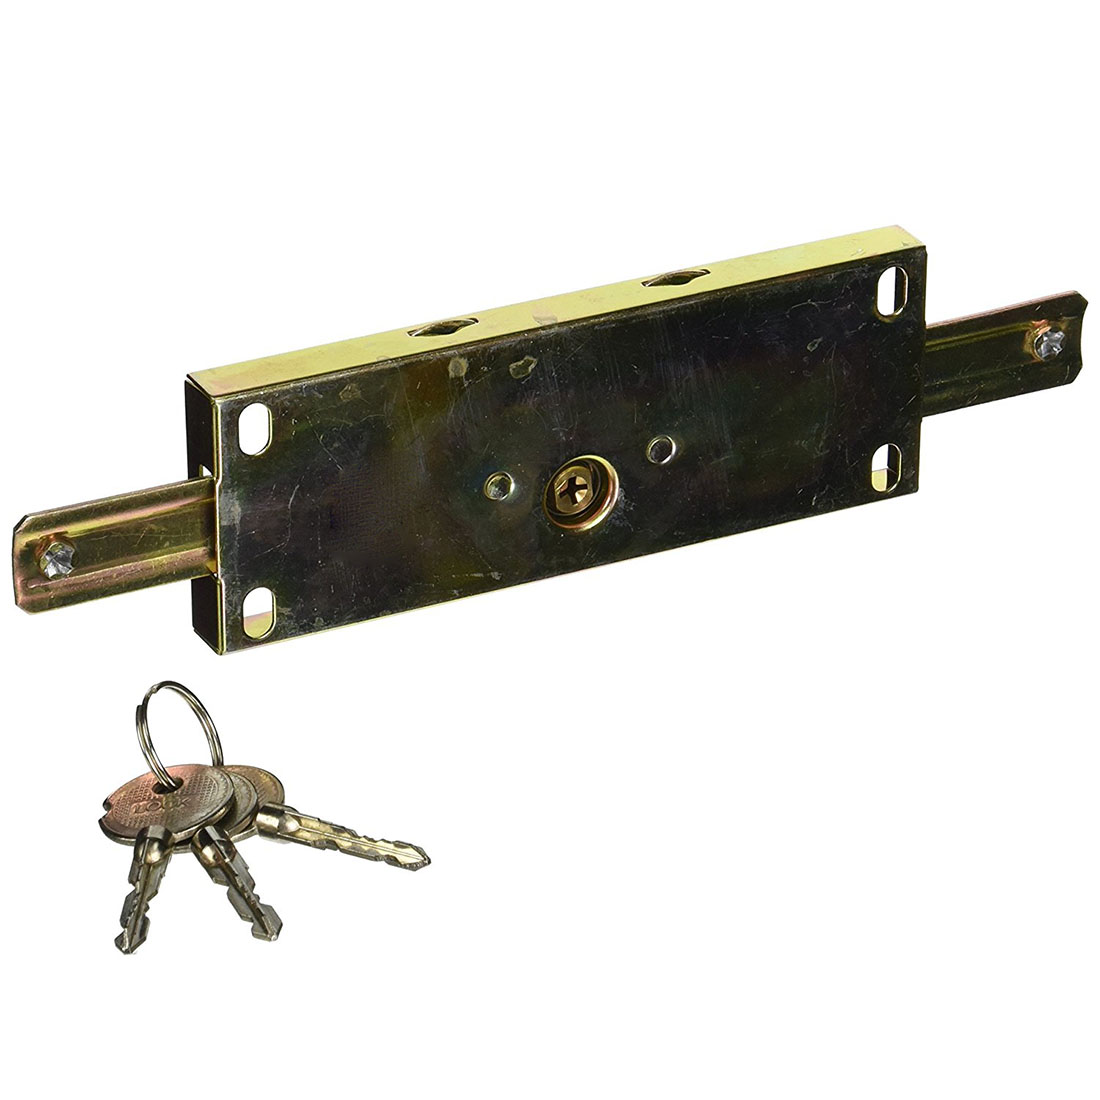 Gold tone Cross Key Metal Center Rolling Shutter Door Lock for Garage key selector ks06 for rolling shutter key switch for garage door